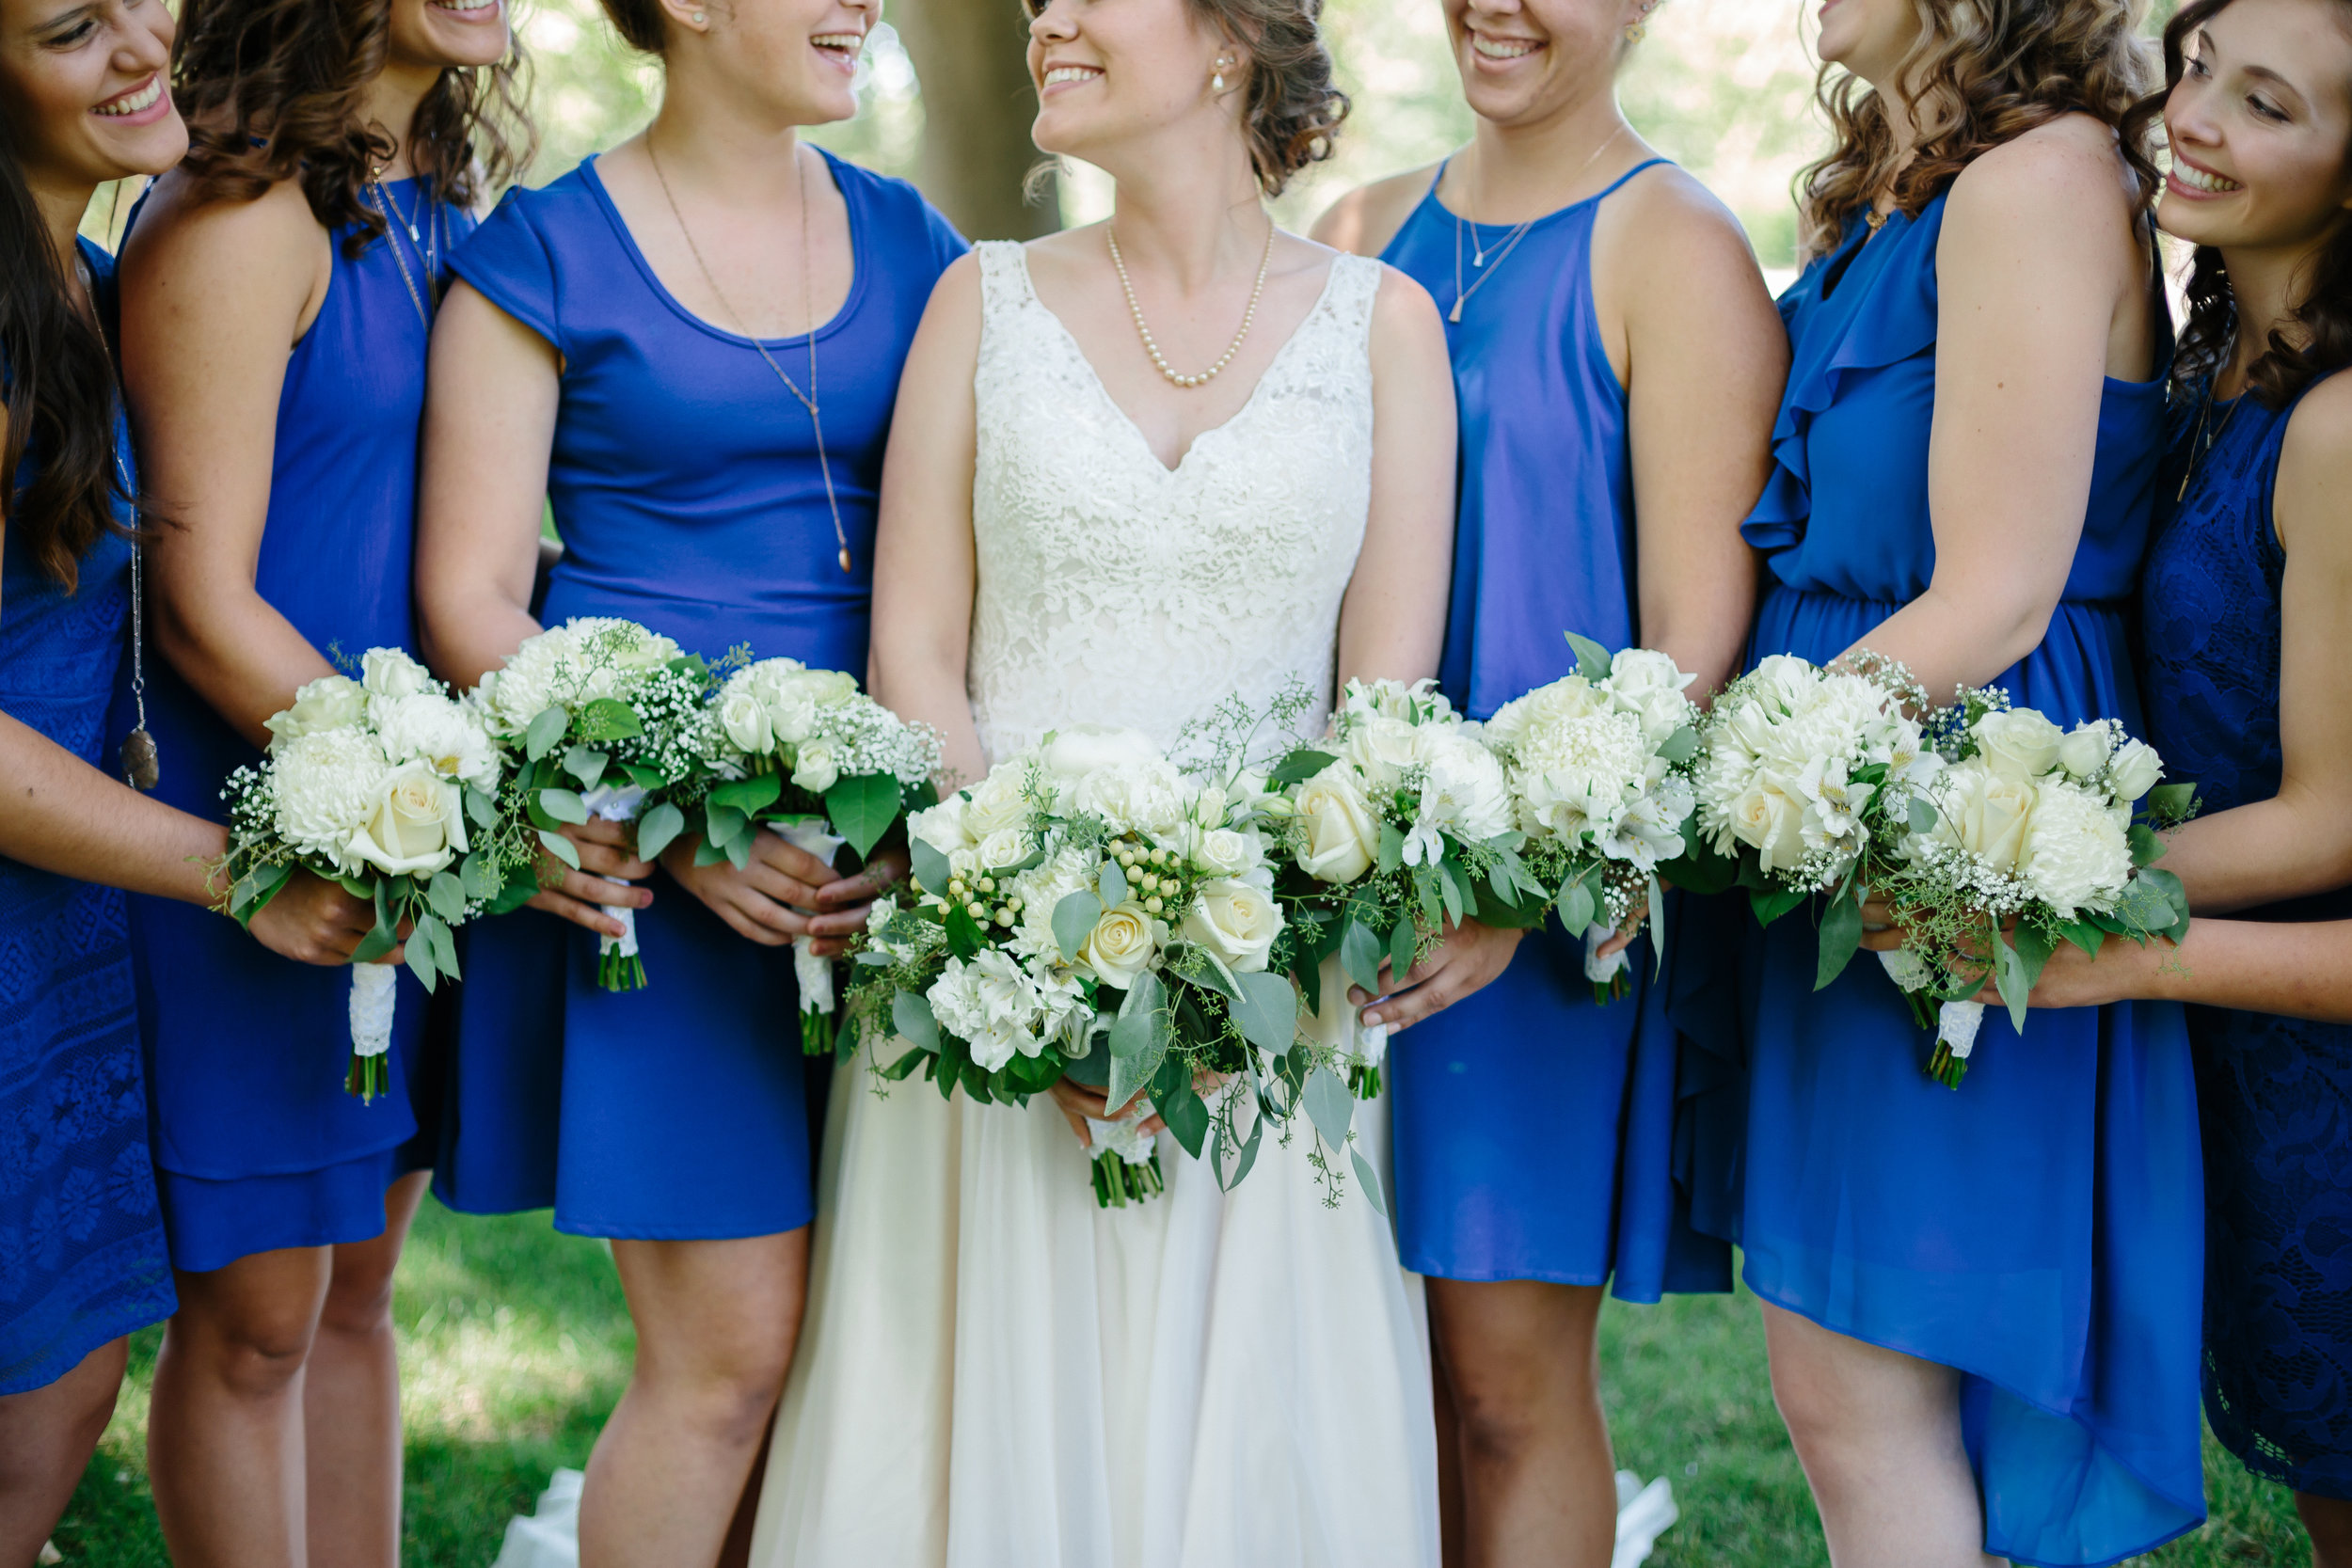 Jordan & Shantel Married - Idaho - Corrie Mick Photography-153.jpg